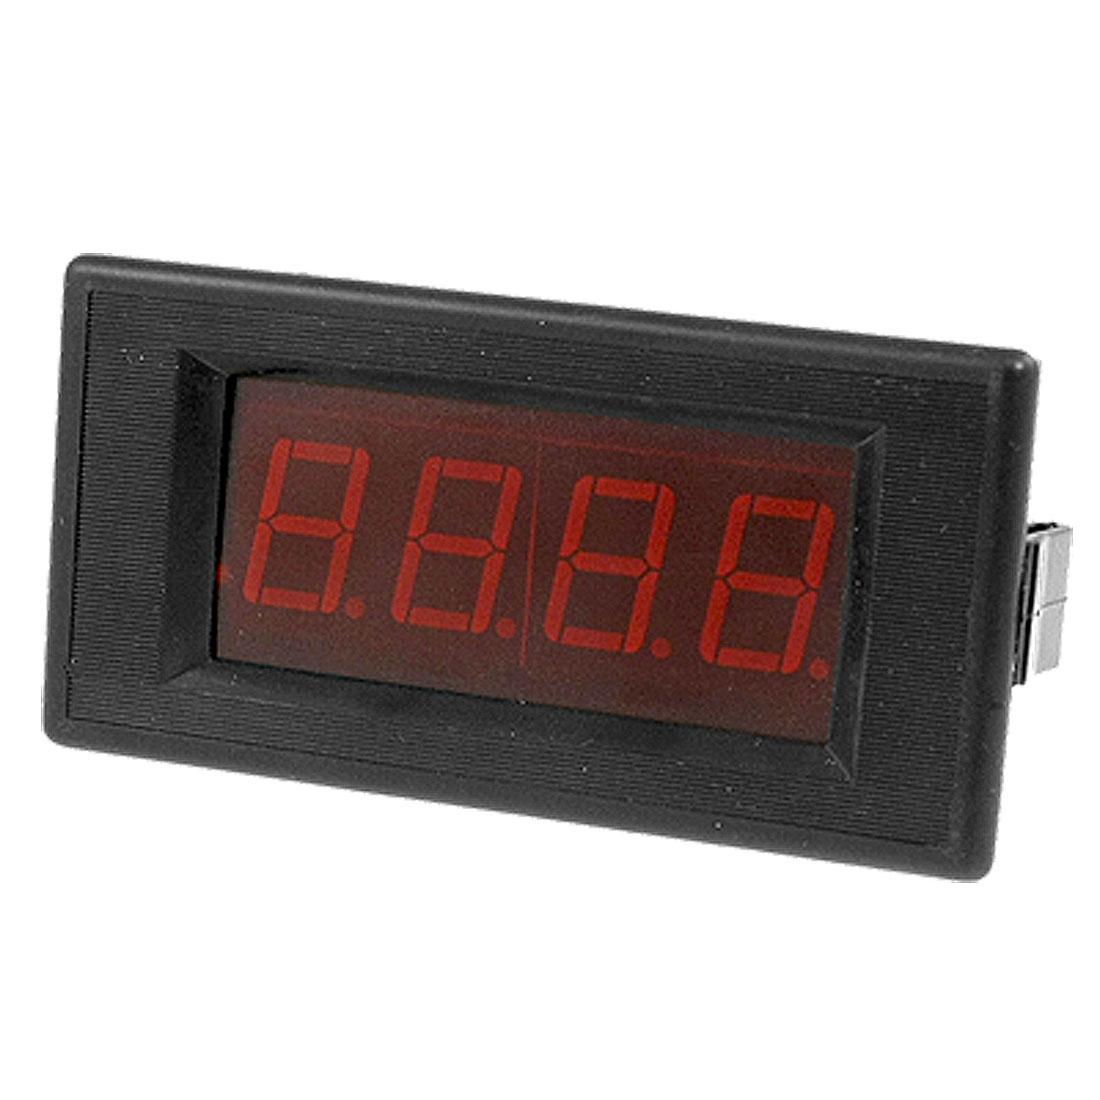 LED Digital Display -100-199.9 Celsius Thermometer Panel Temperature Meter